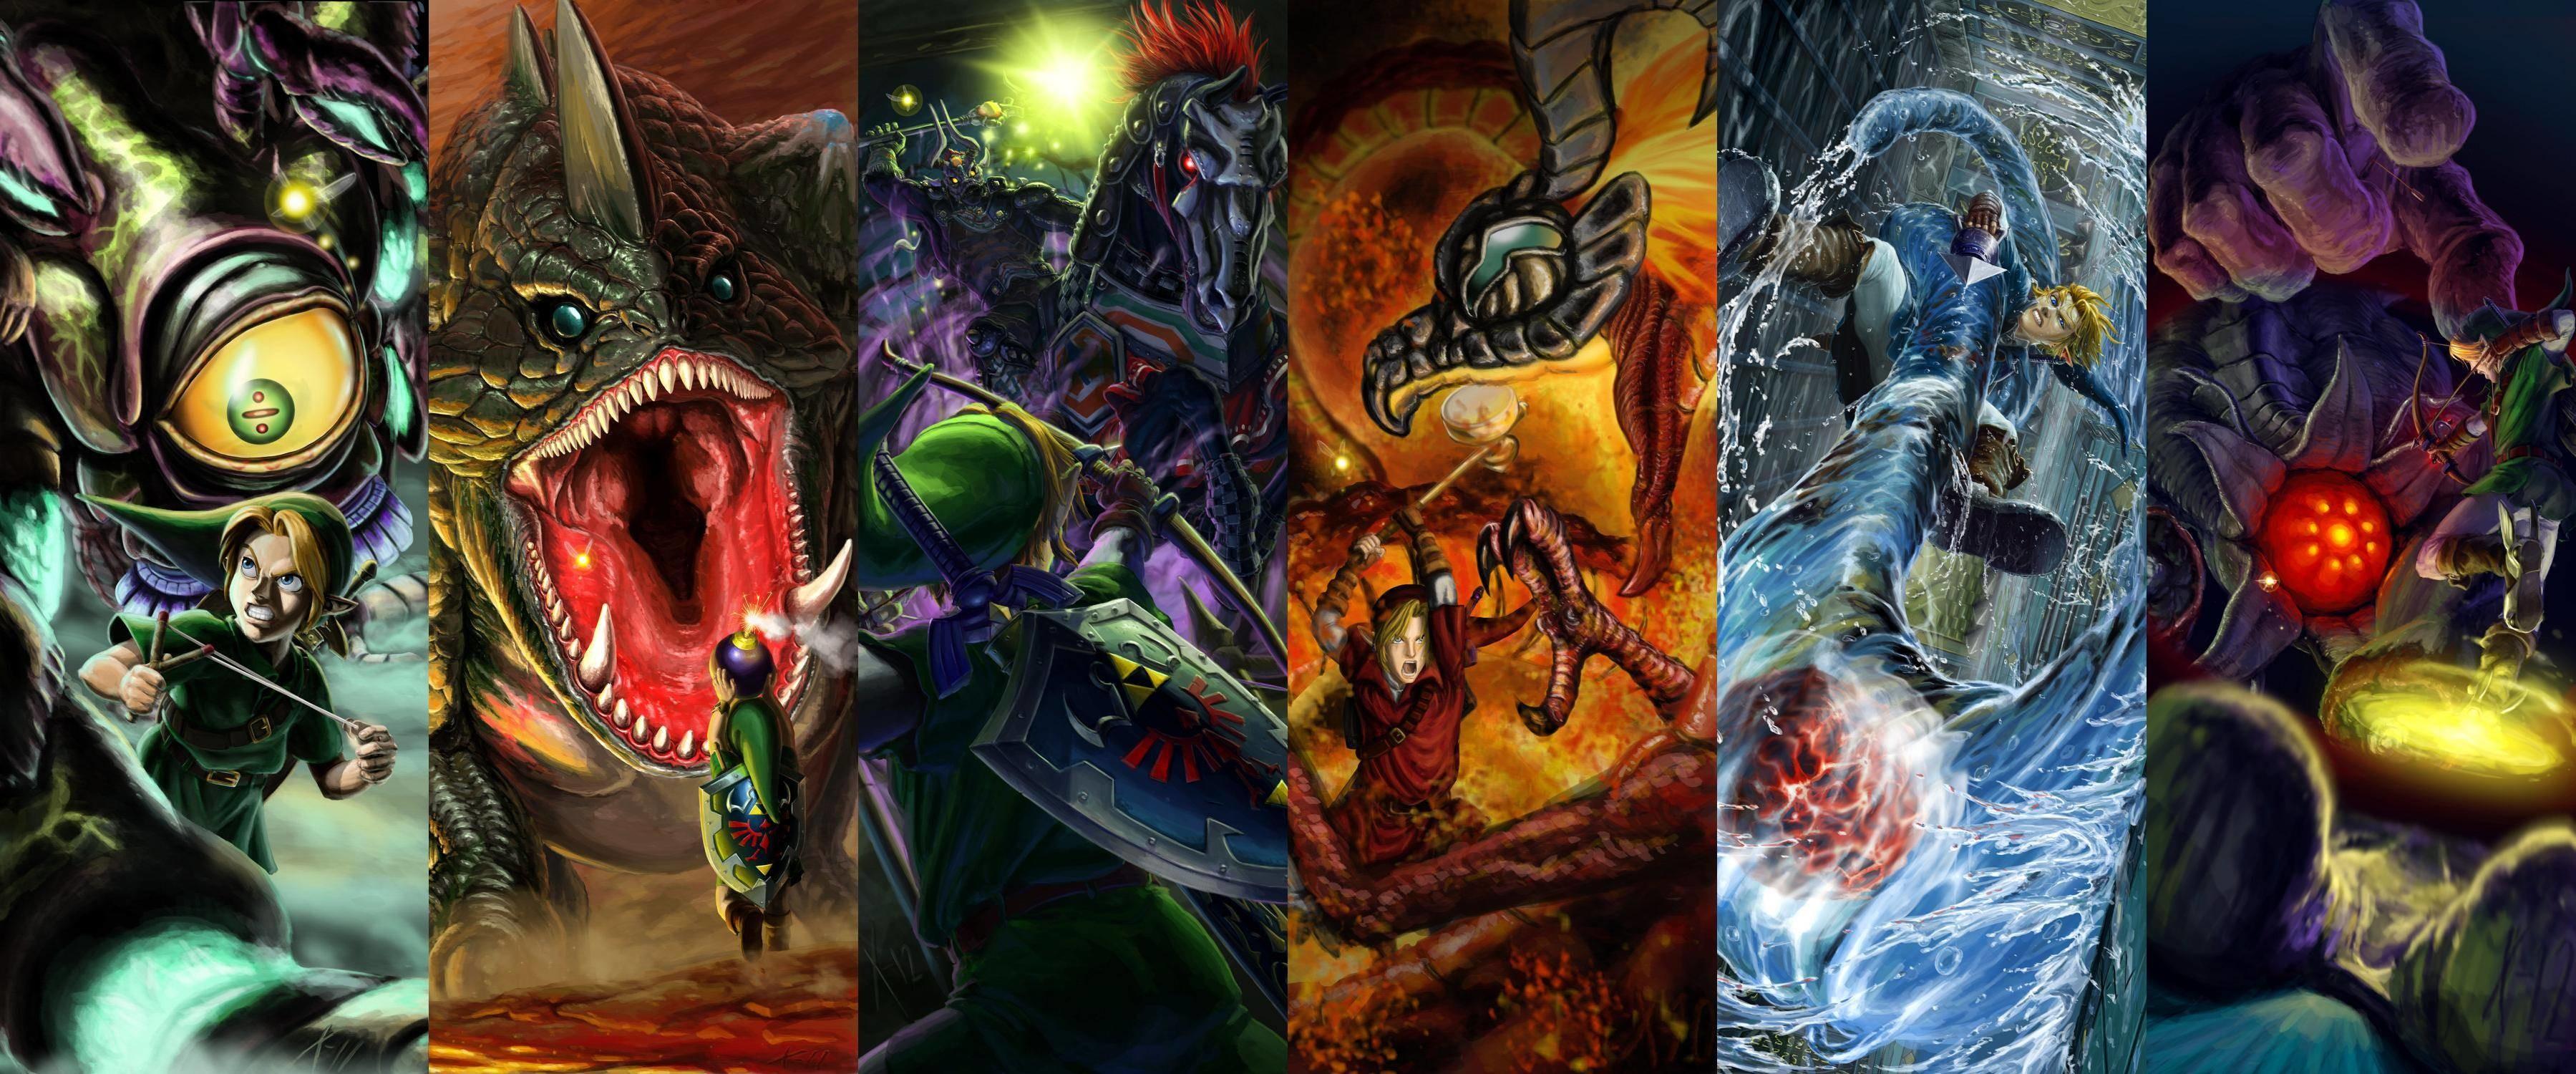 Legend Of Zelda Ocarina Of Time Wallpaper High Quality …